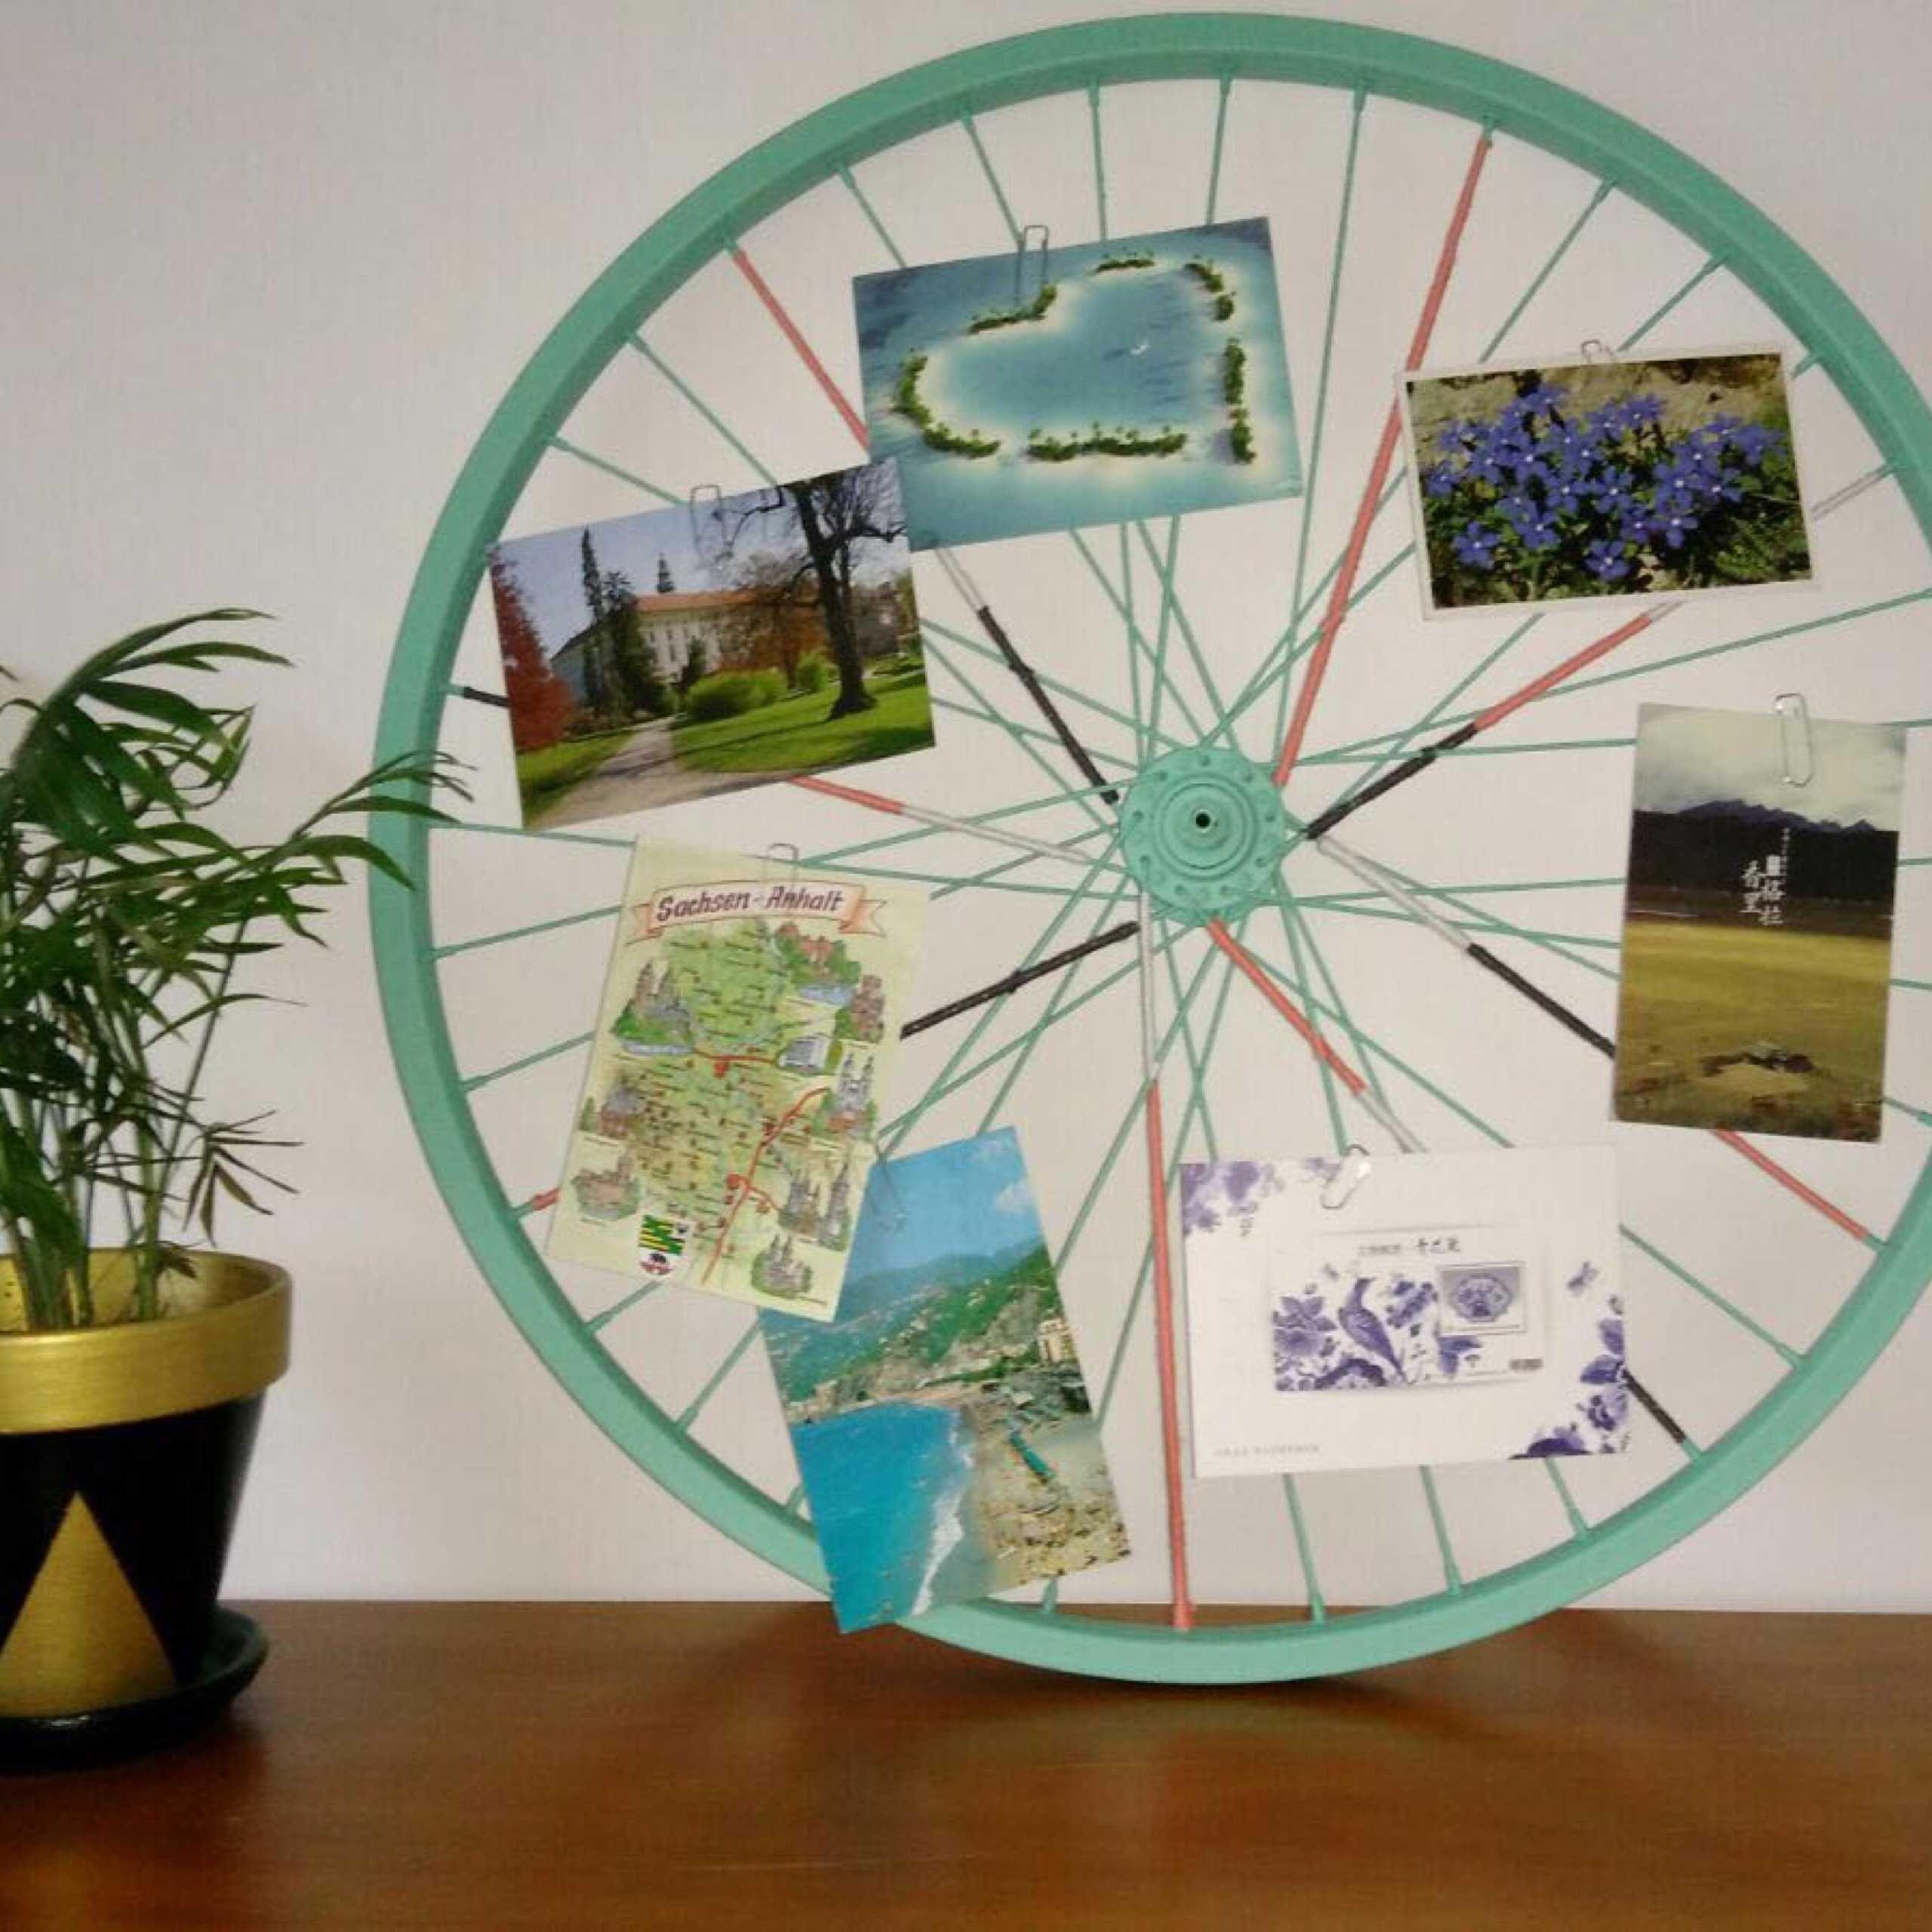 tutoriel diy transformer une roue de v lo en p le m le. Black Bedroom Furniture Sets. Home Design Ideas